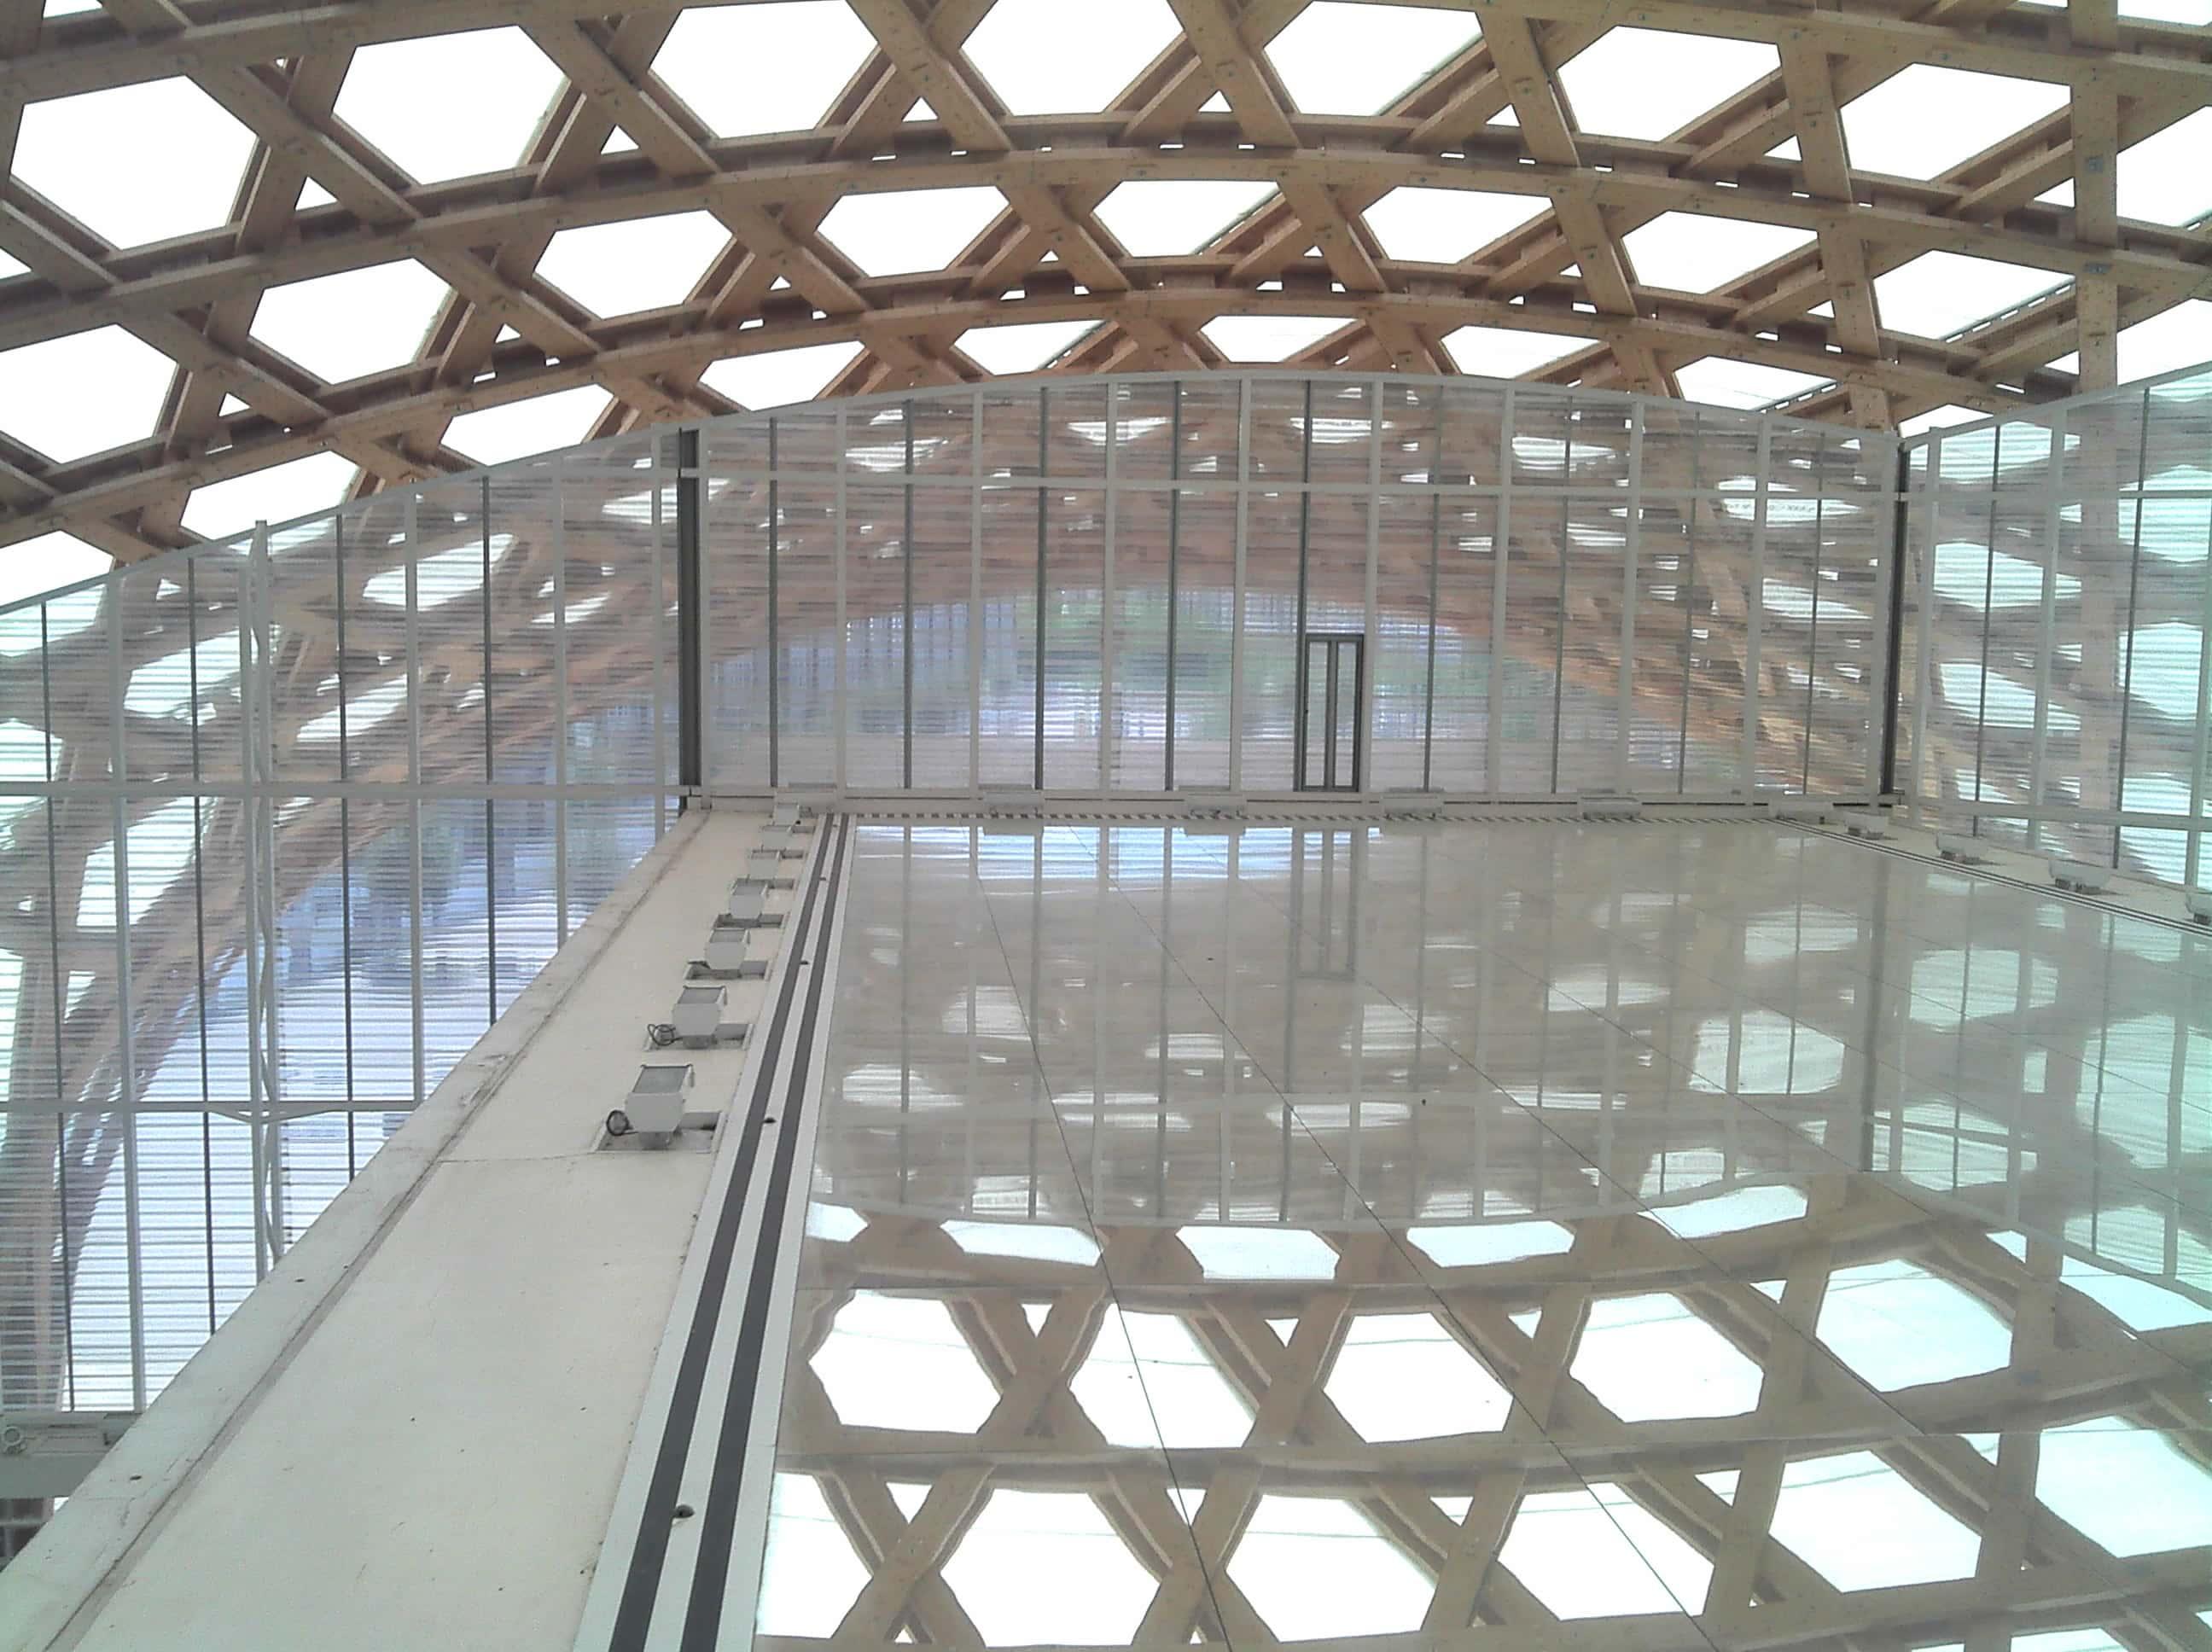 Sol LeWitt au Centre Pompidou-Metz - Rue89 Strasbourg